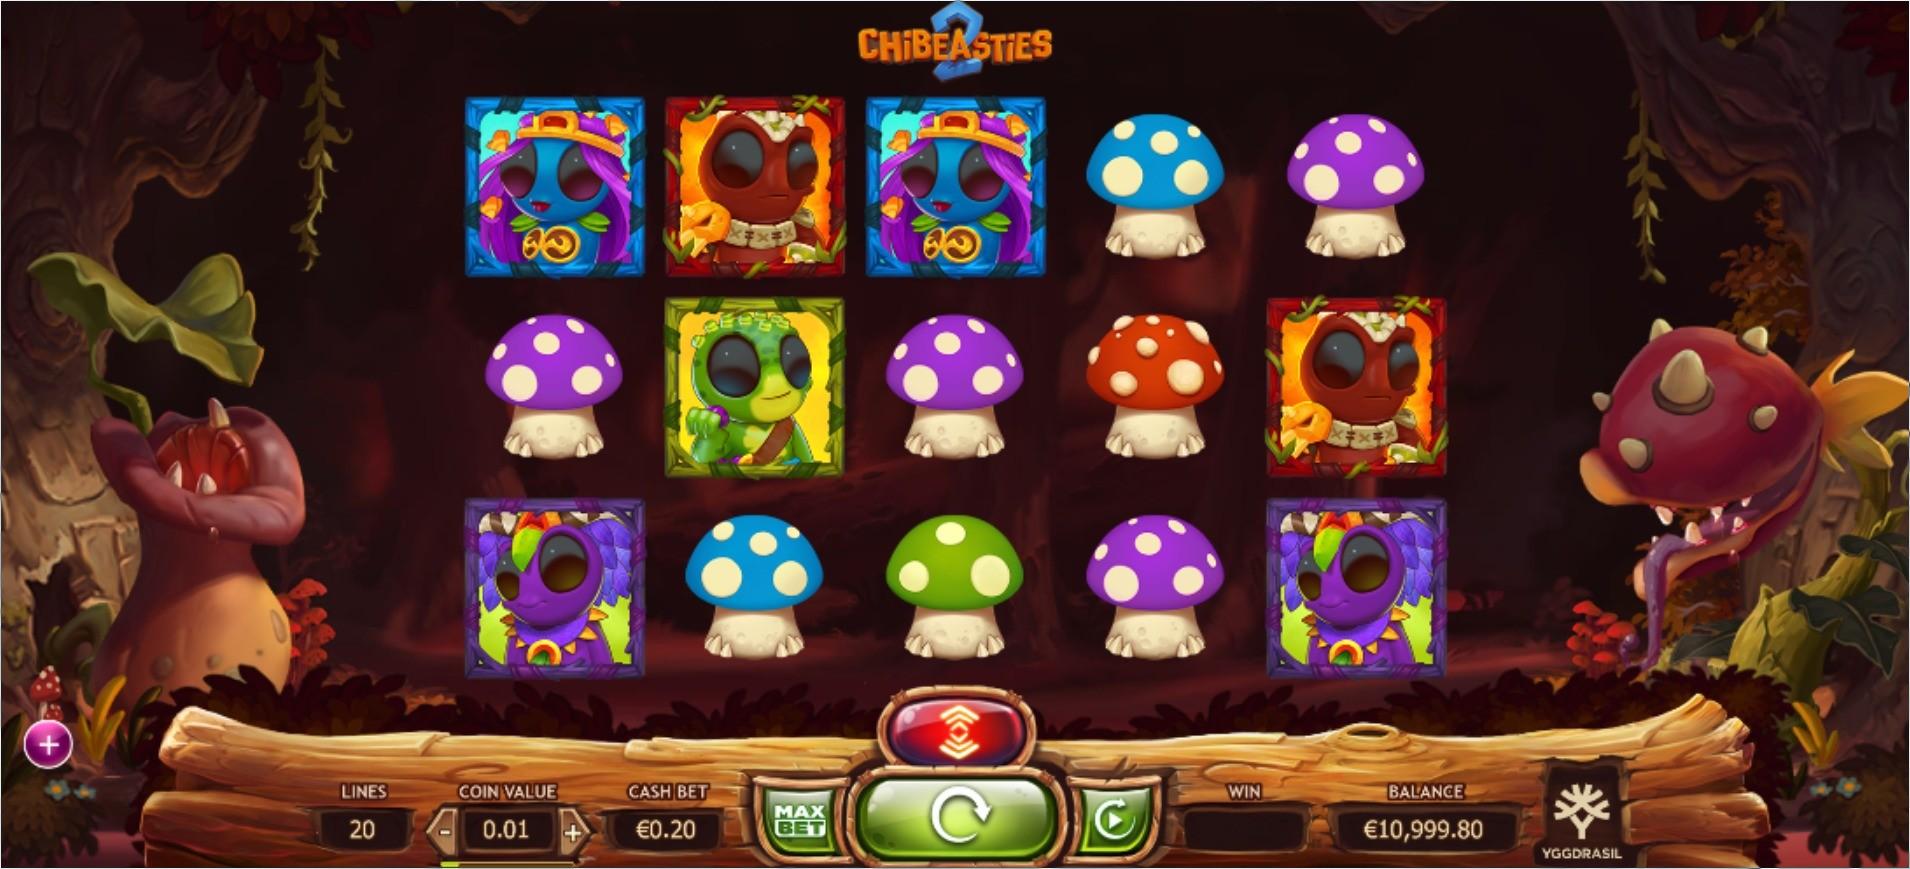 Spin casino free